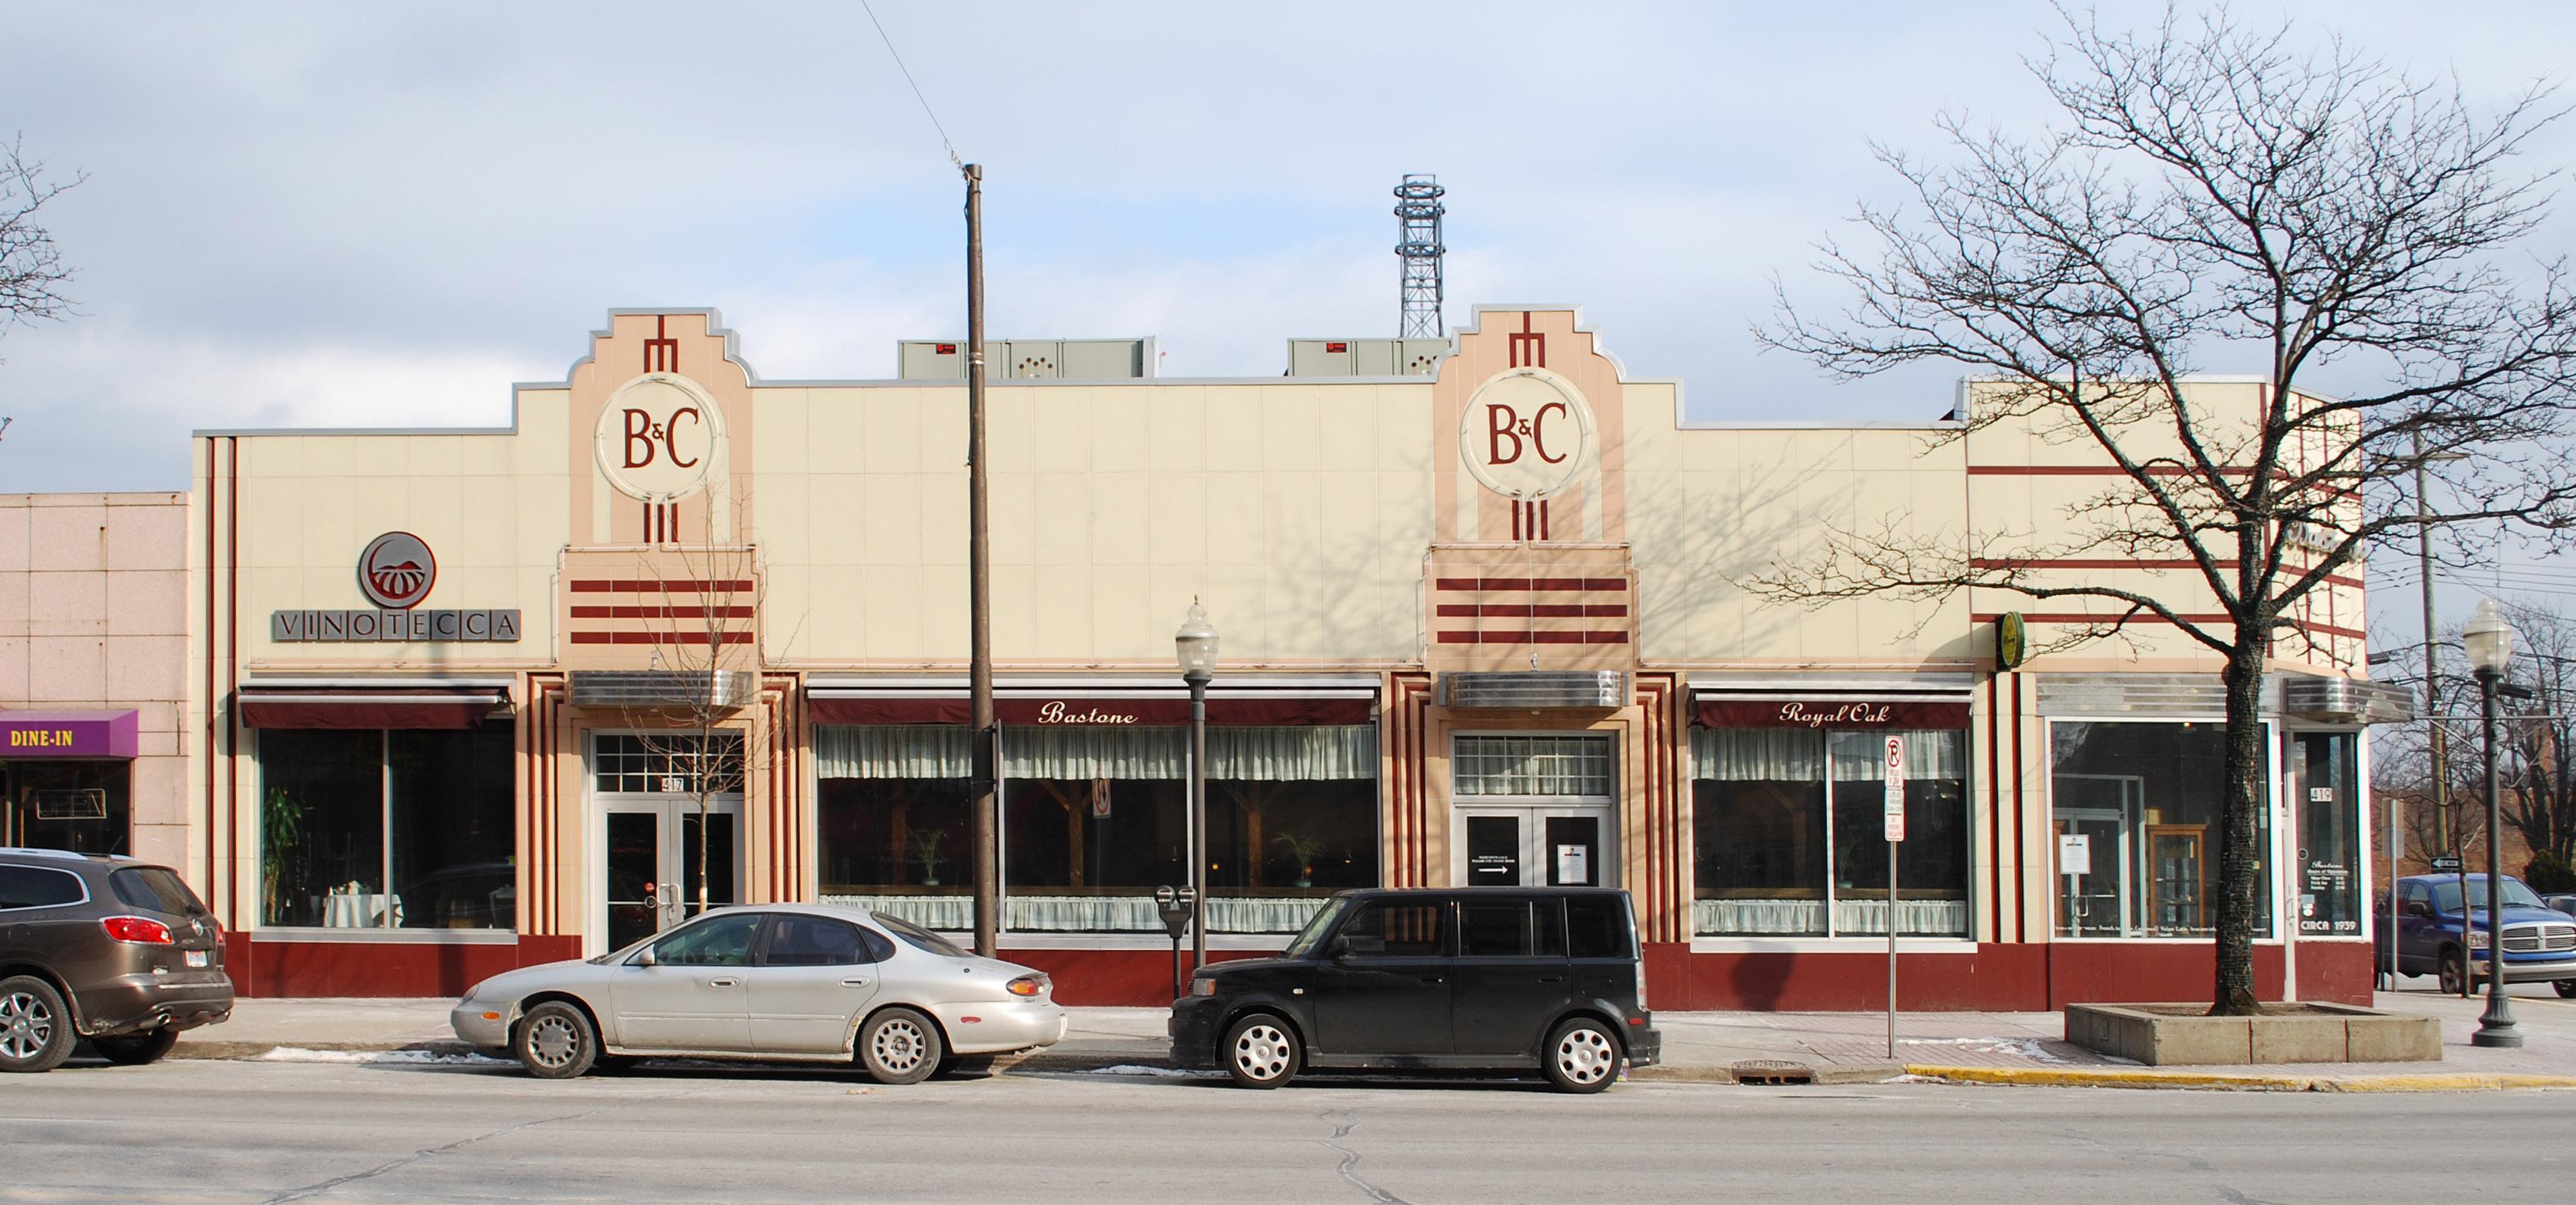 File:B and C Grocery Building Royal Oak MI.jpg - Wikimedia ...